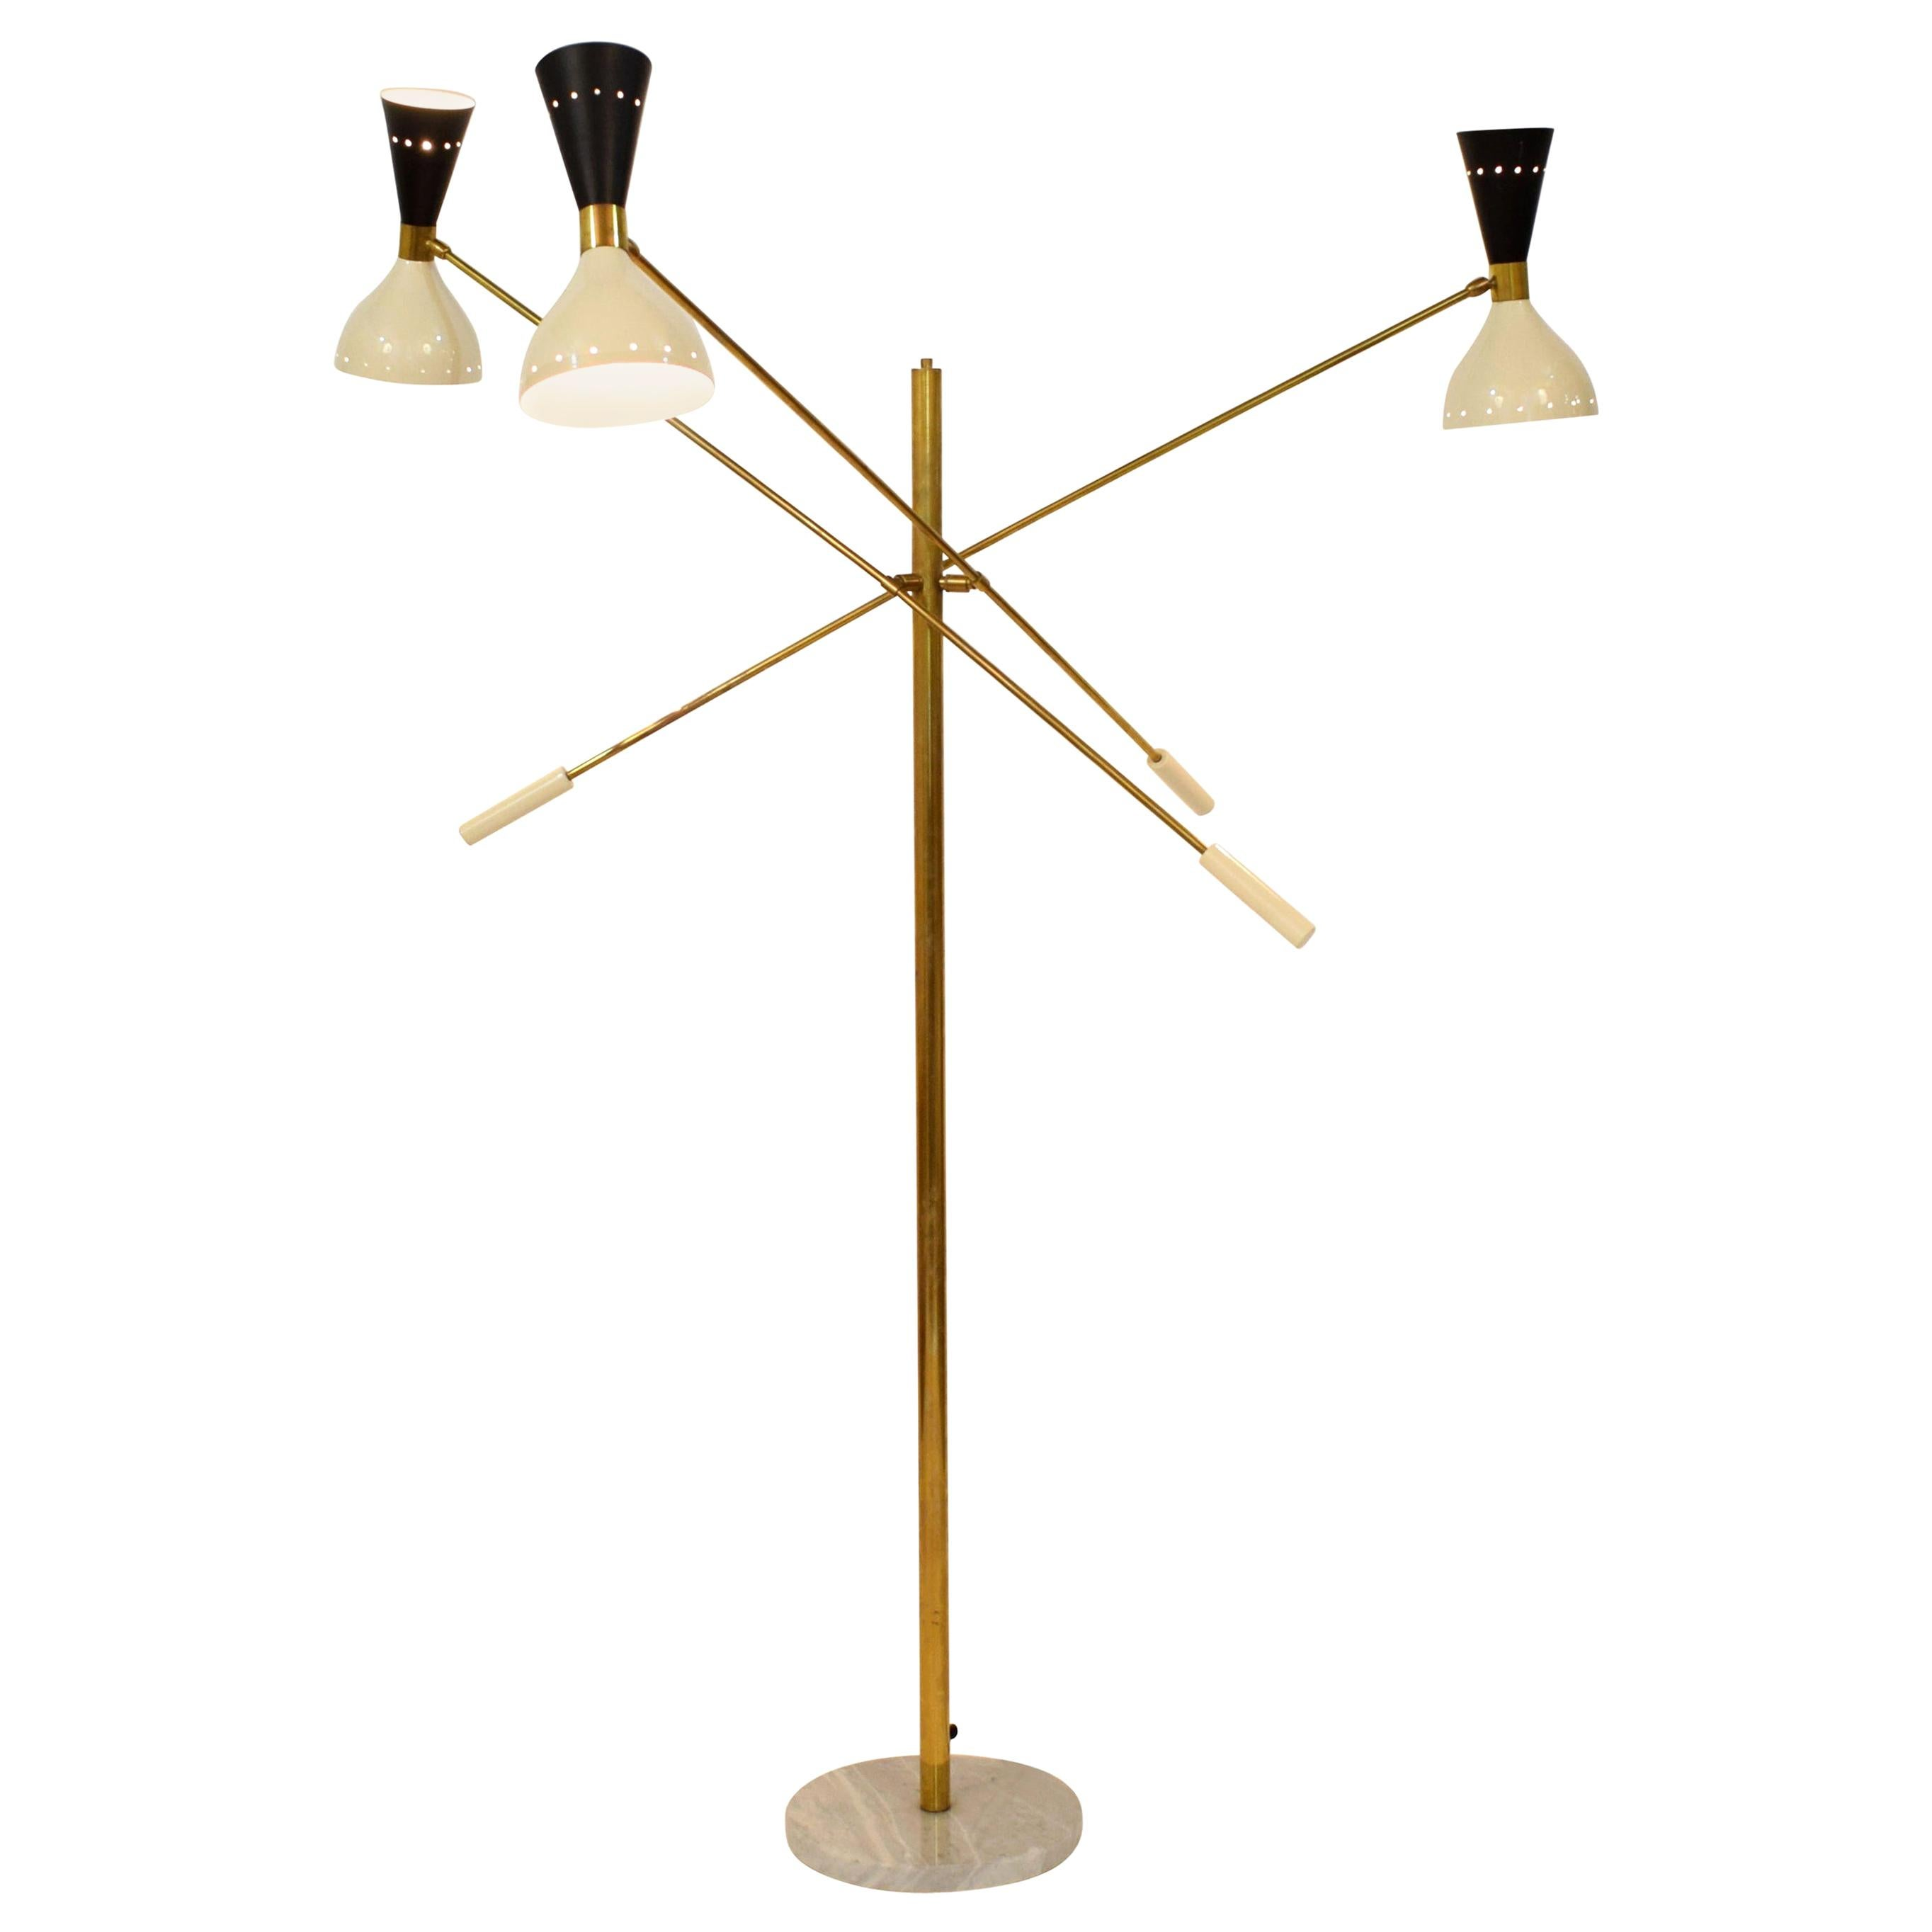 Midcentury Stilnovo Style Italian Floor Lamp Three-Arm Brass and Marble Black